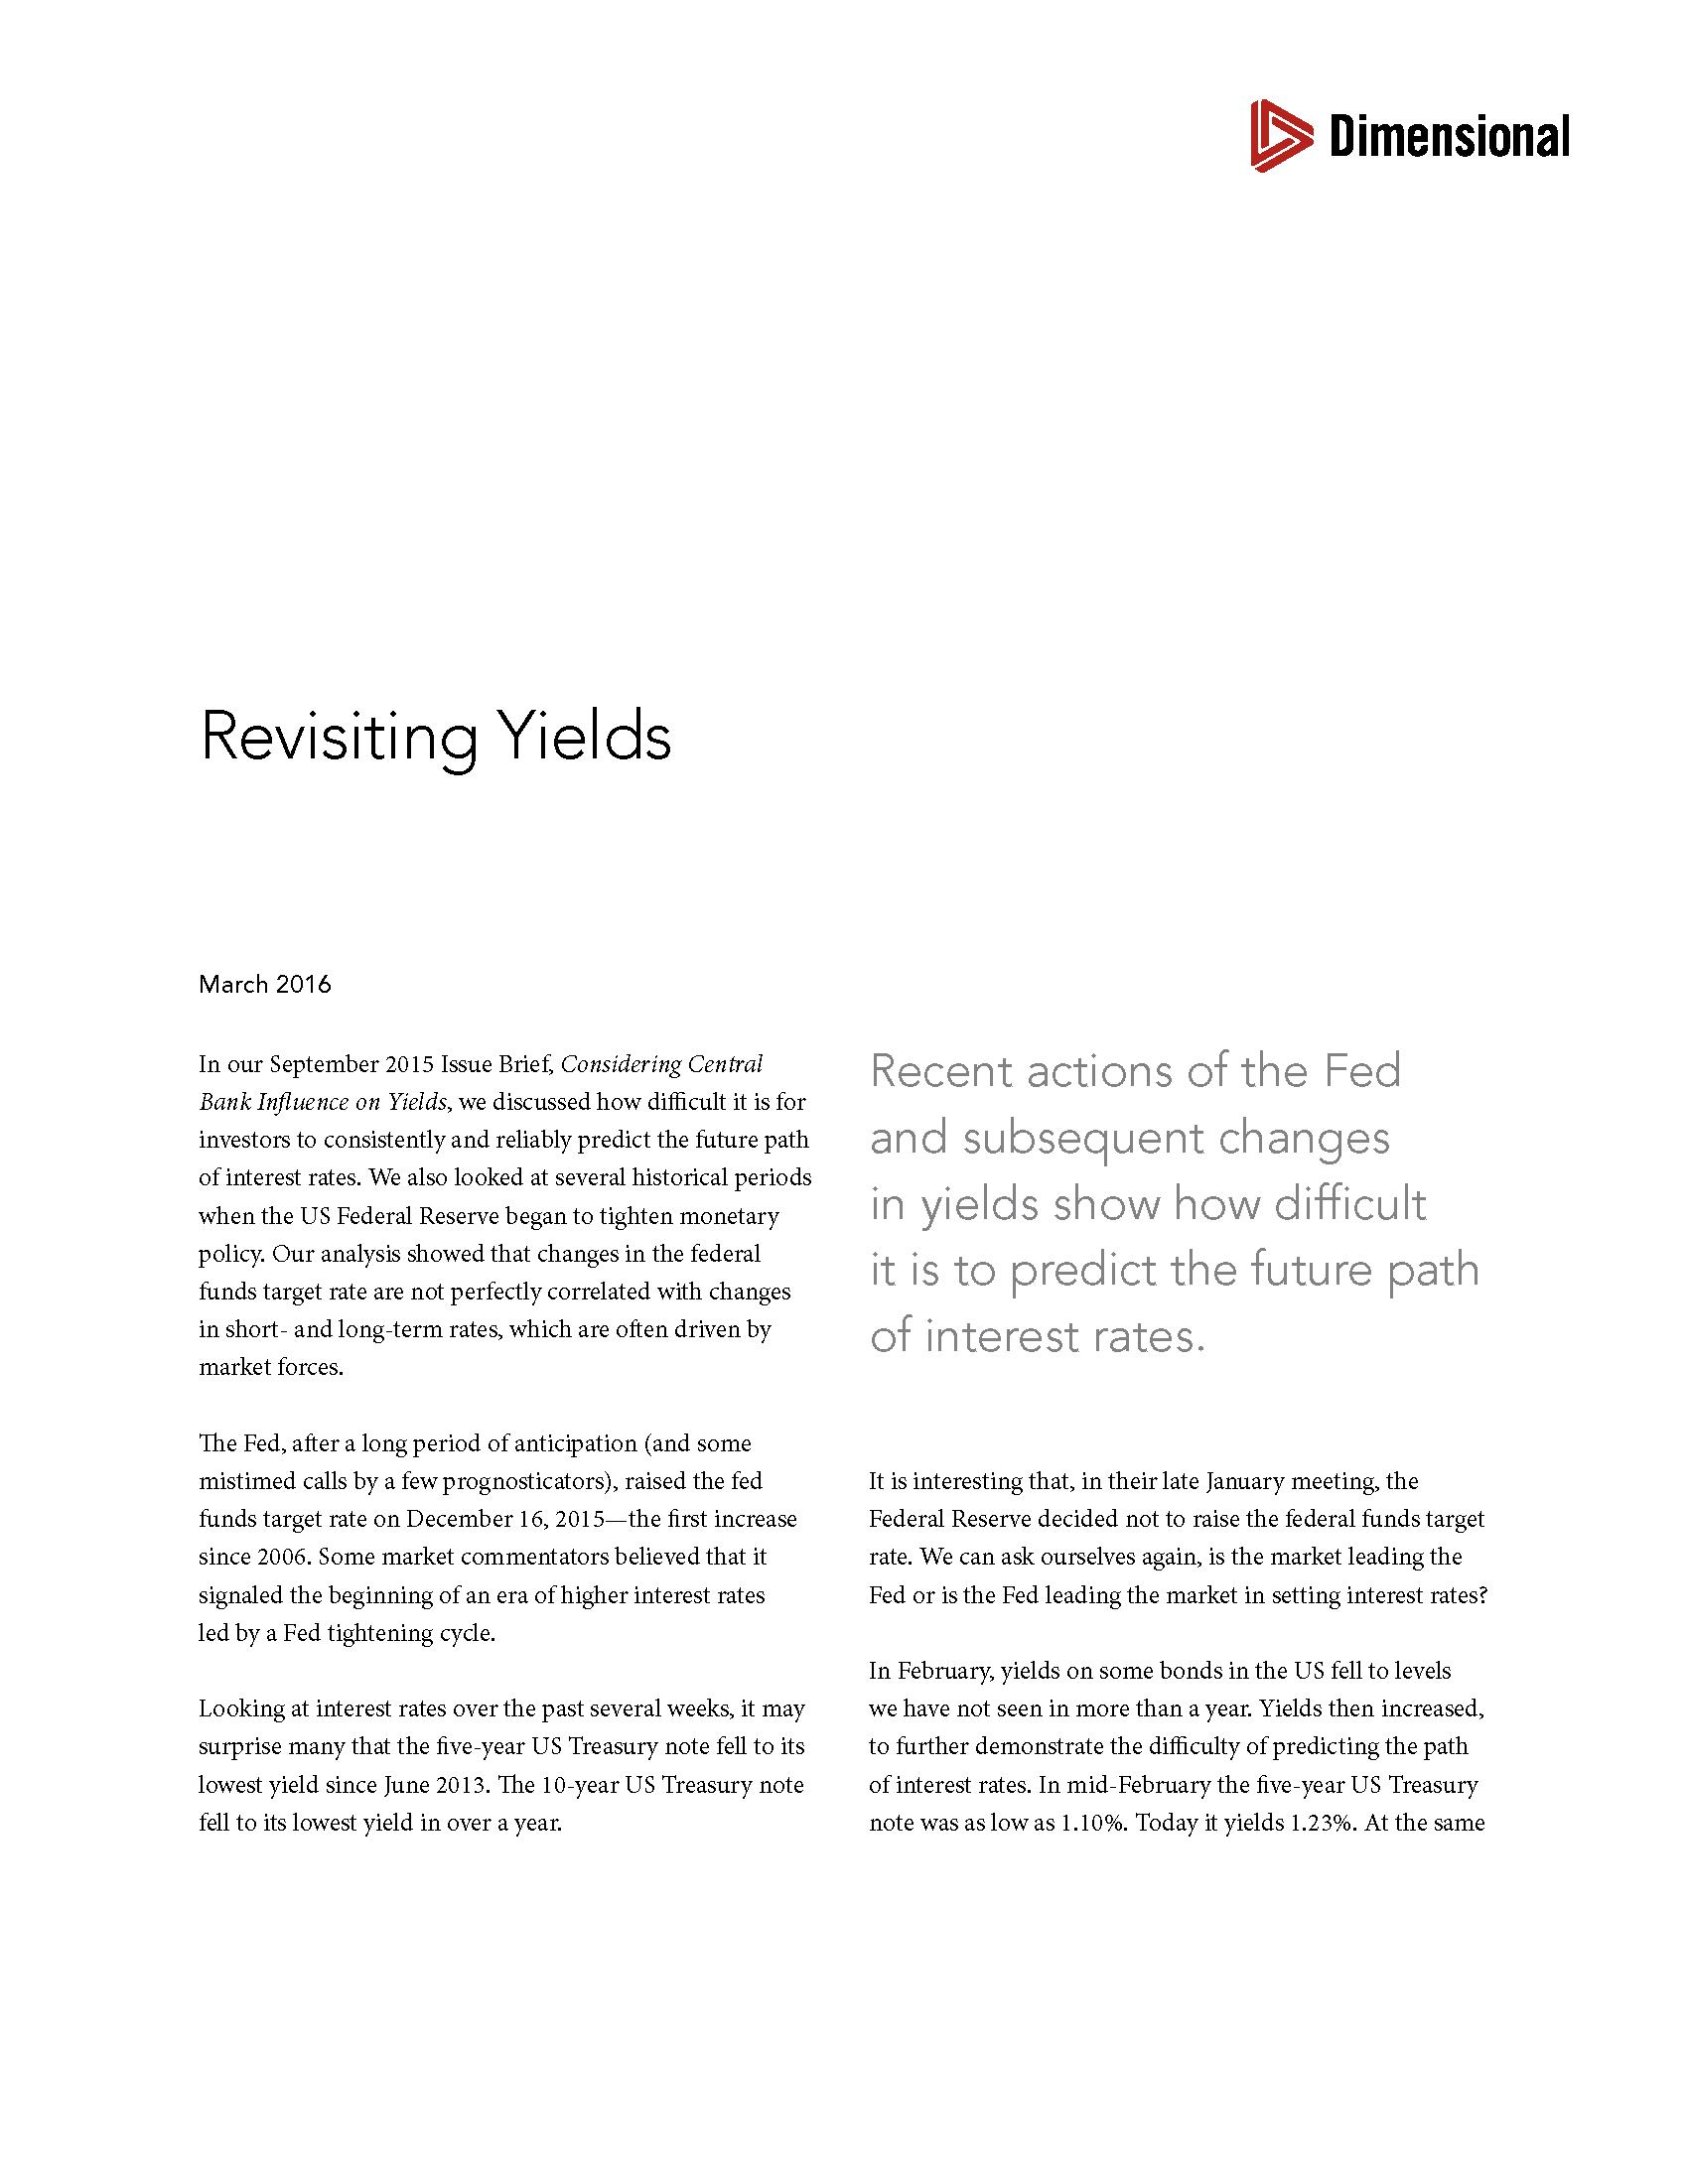 DFA Advisor Yield Report